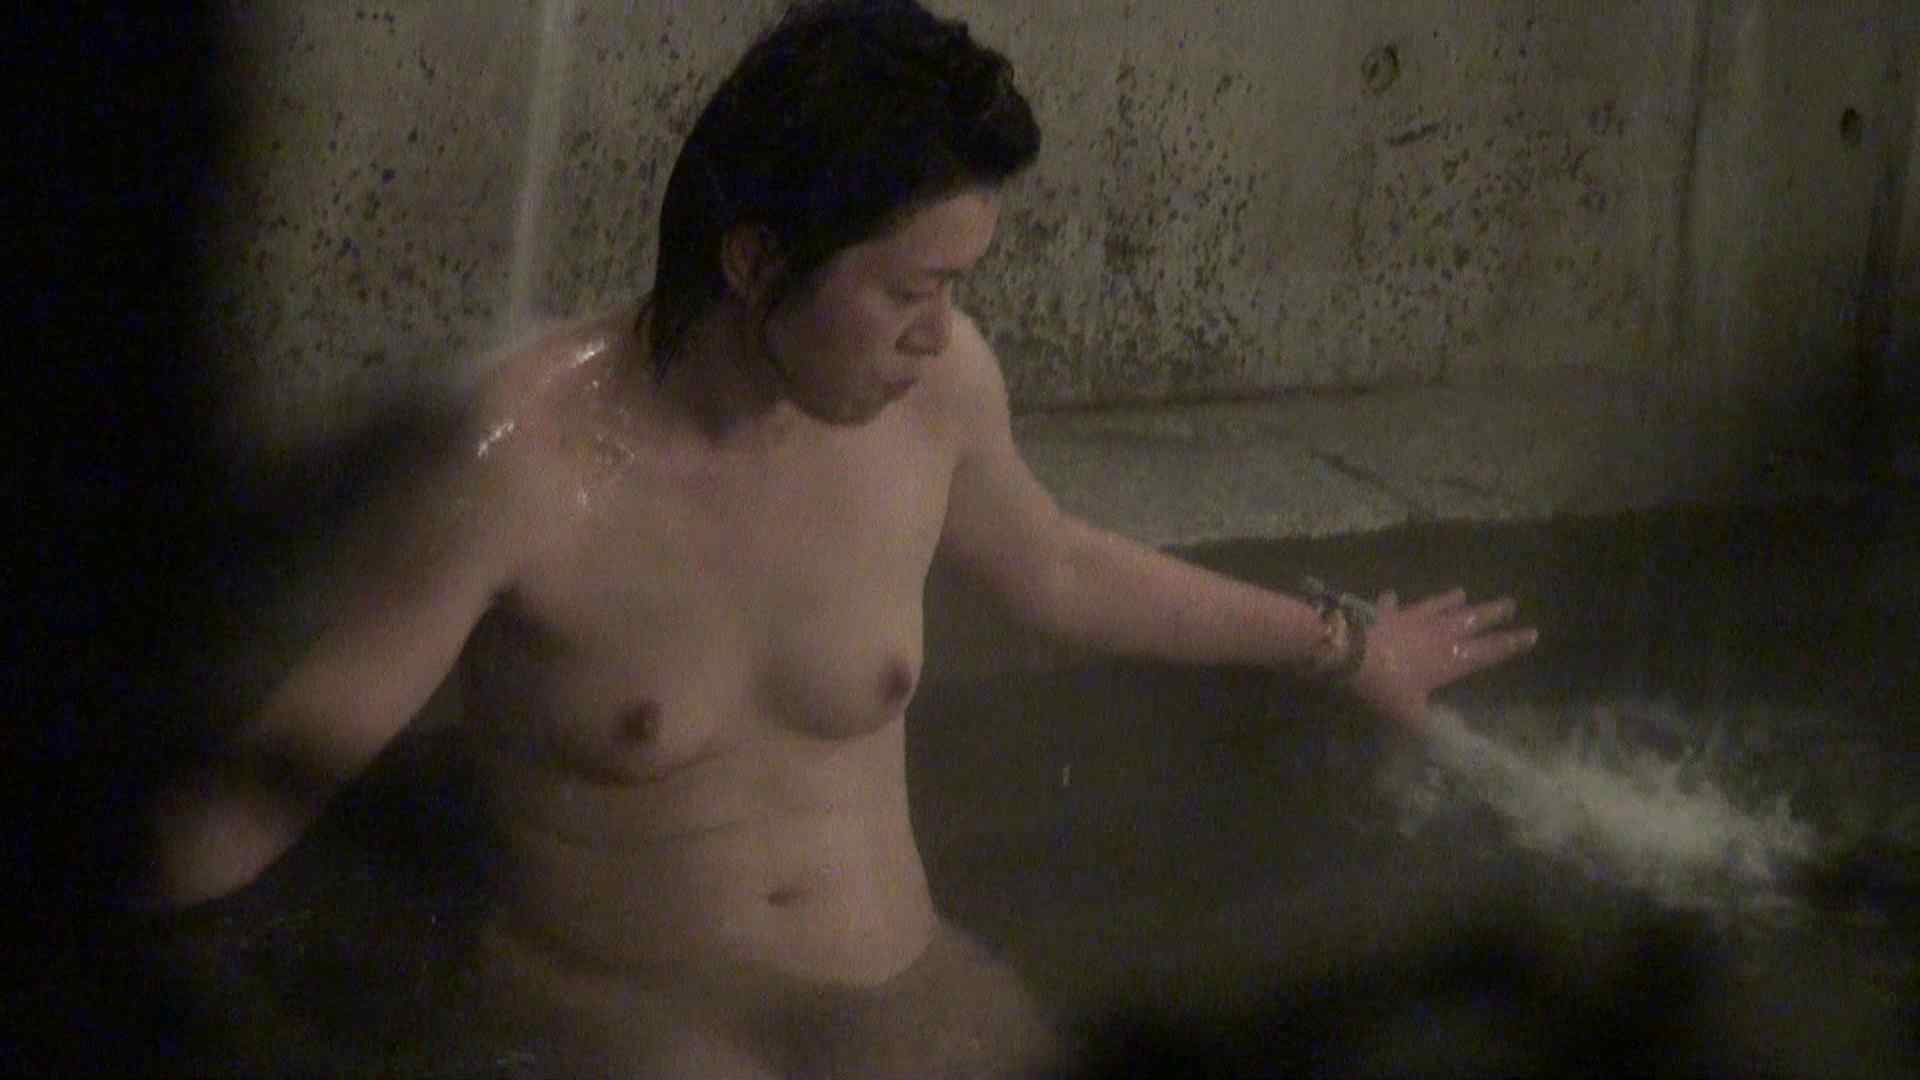 Aquaな露天風呂Vol.409 0  99連発 60